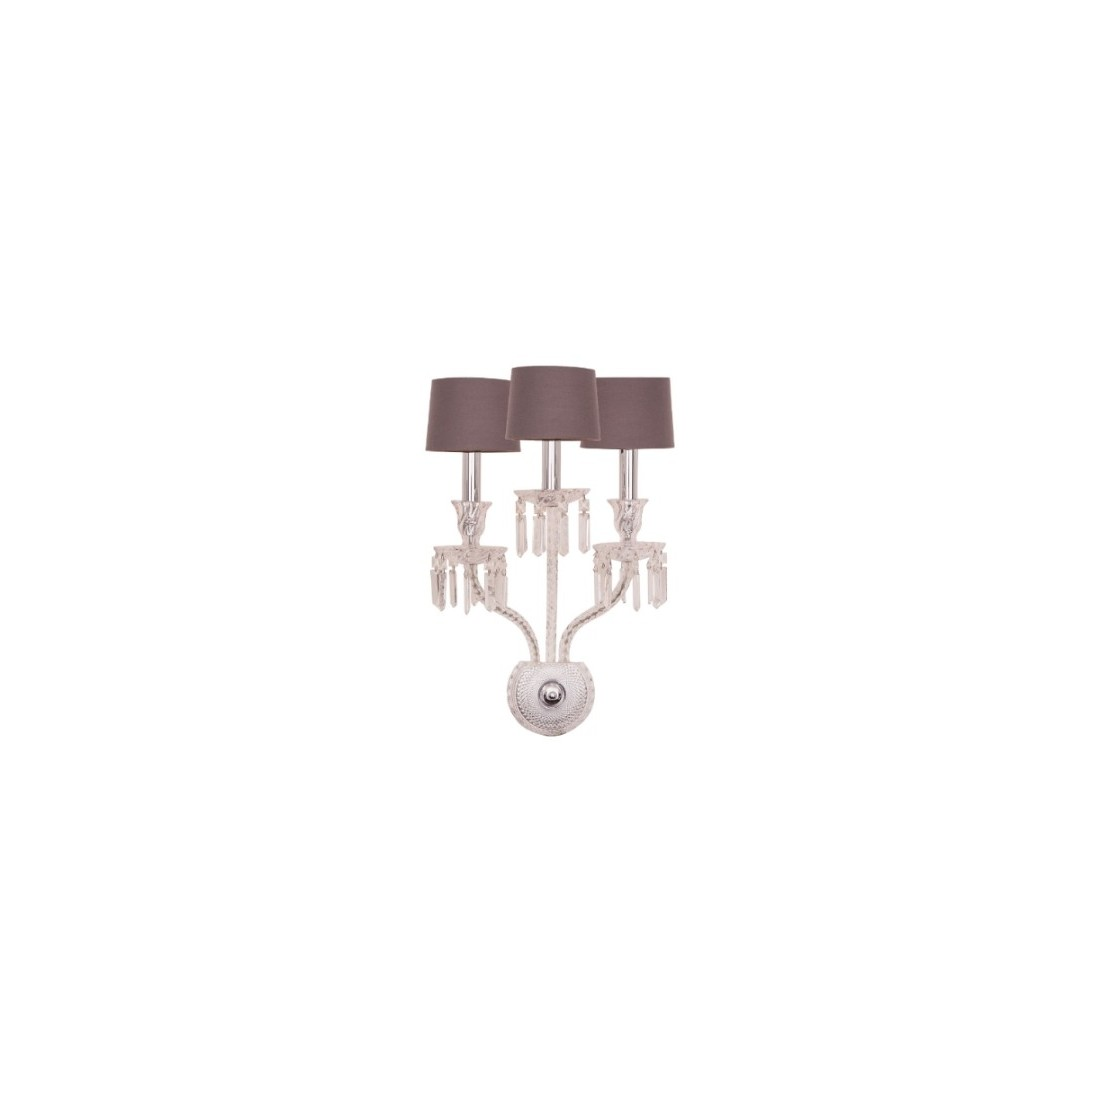 RV Astley - Elegance 3 Arm nástěnná lampa